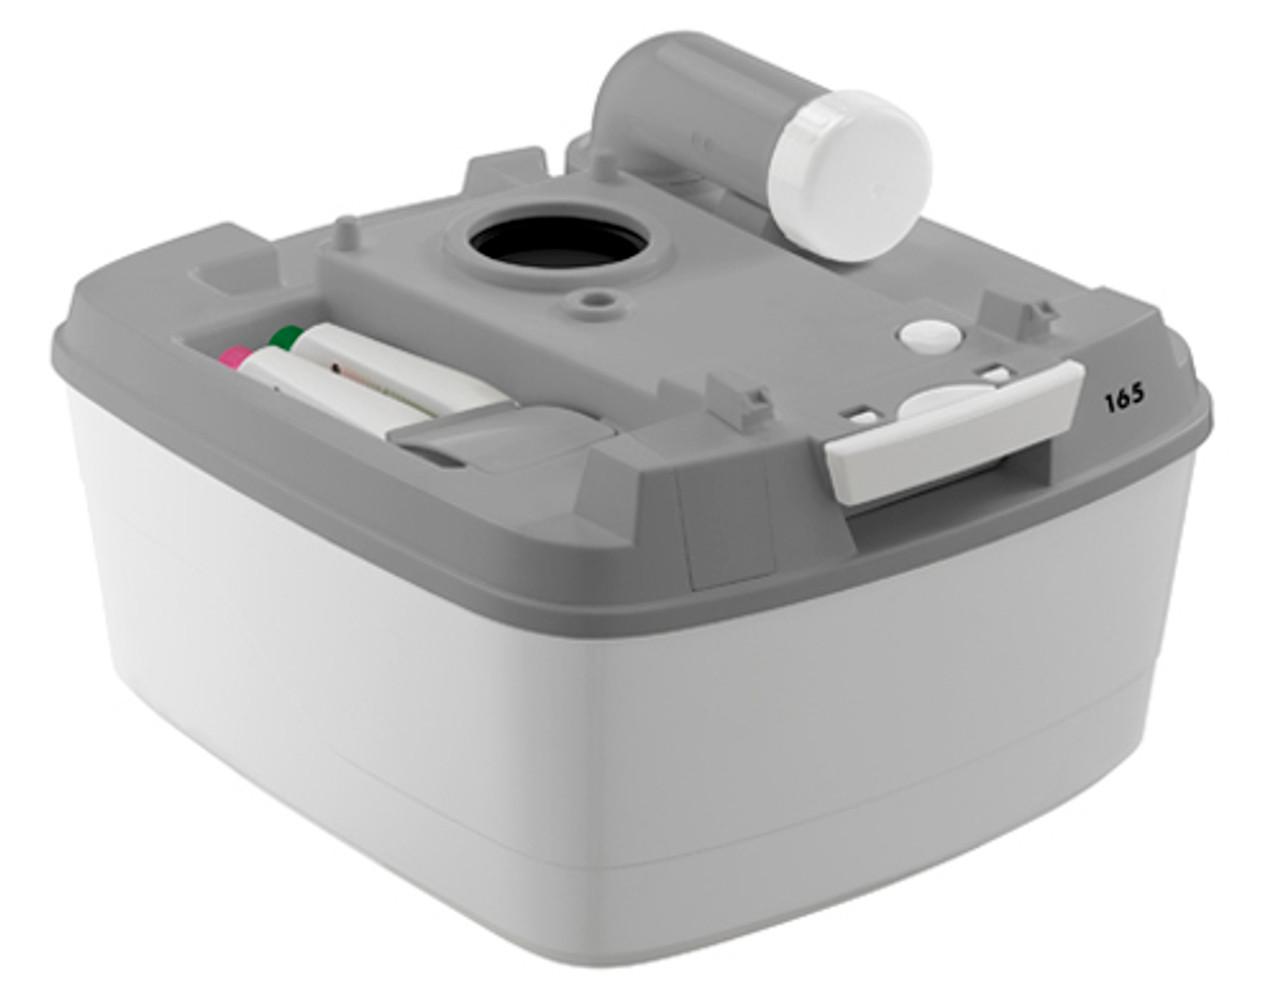 Bottom tank of the chemical Porta Potti camping 165 toilet